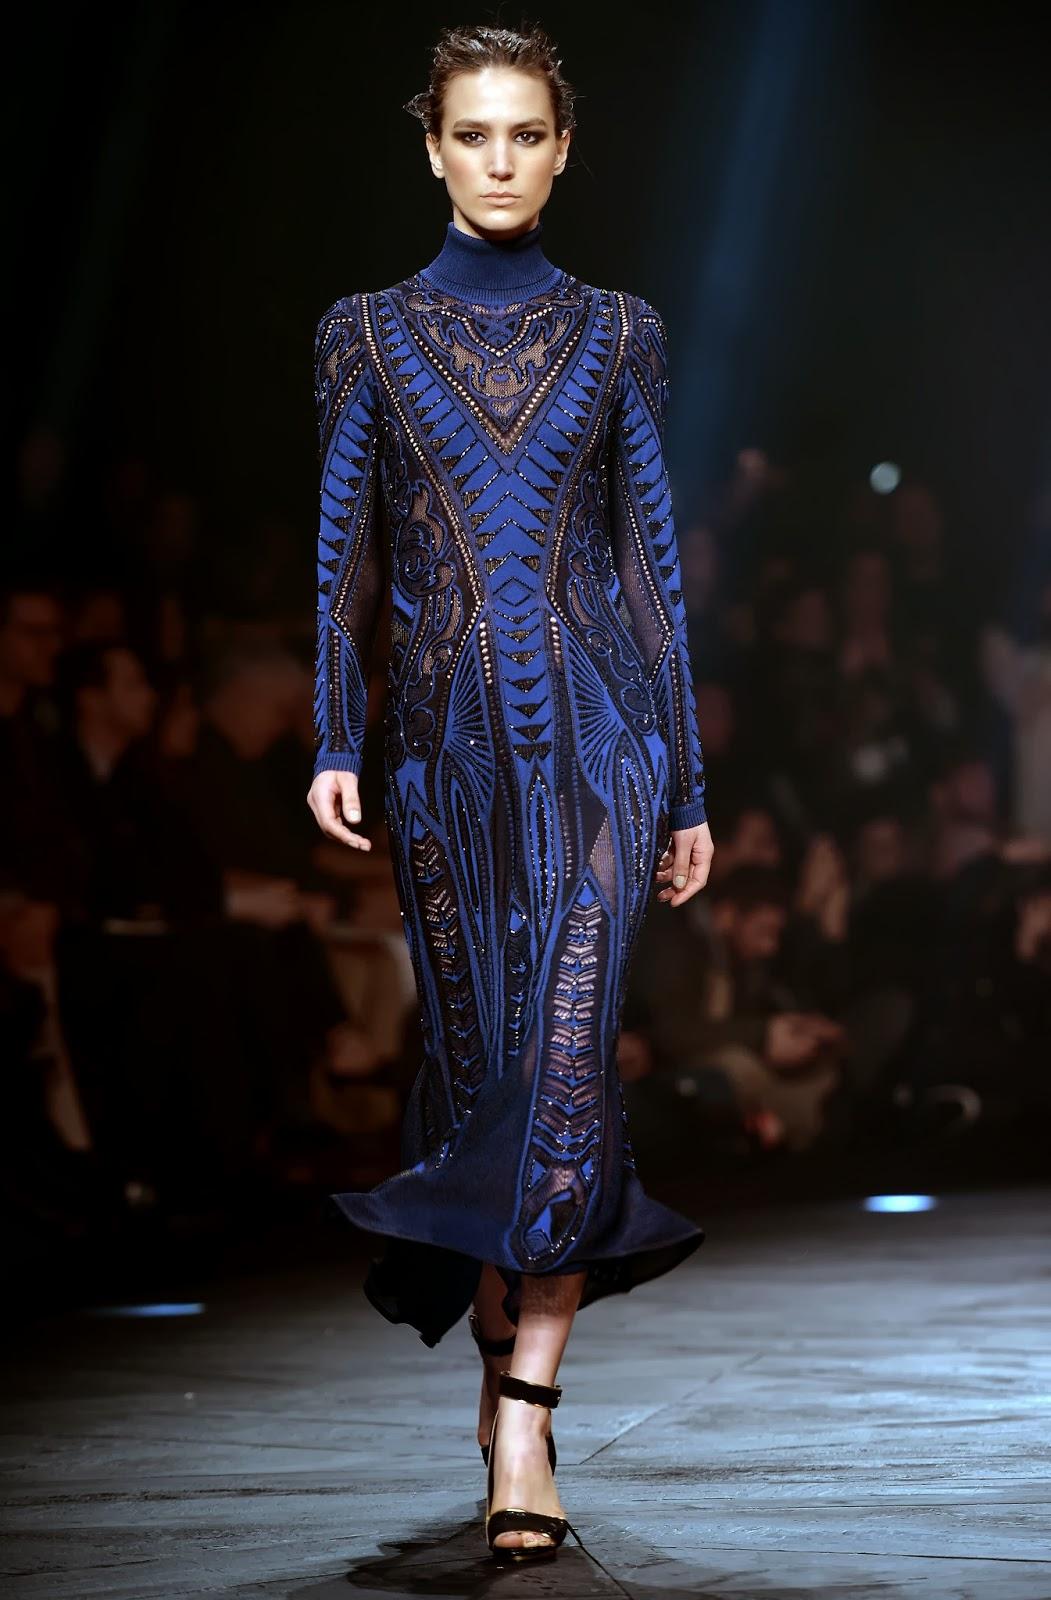 2014, Antonio Marras, Collections, Creation, Designer, Fashion, Fashion Week, Jil Sander, Lombardy, Milan Women Fashion Week, Model, Showbiz,